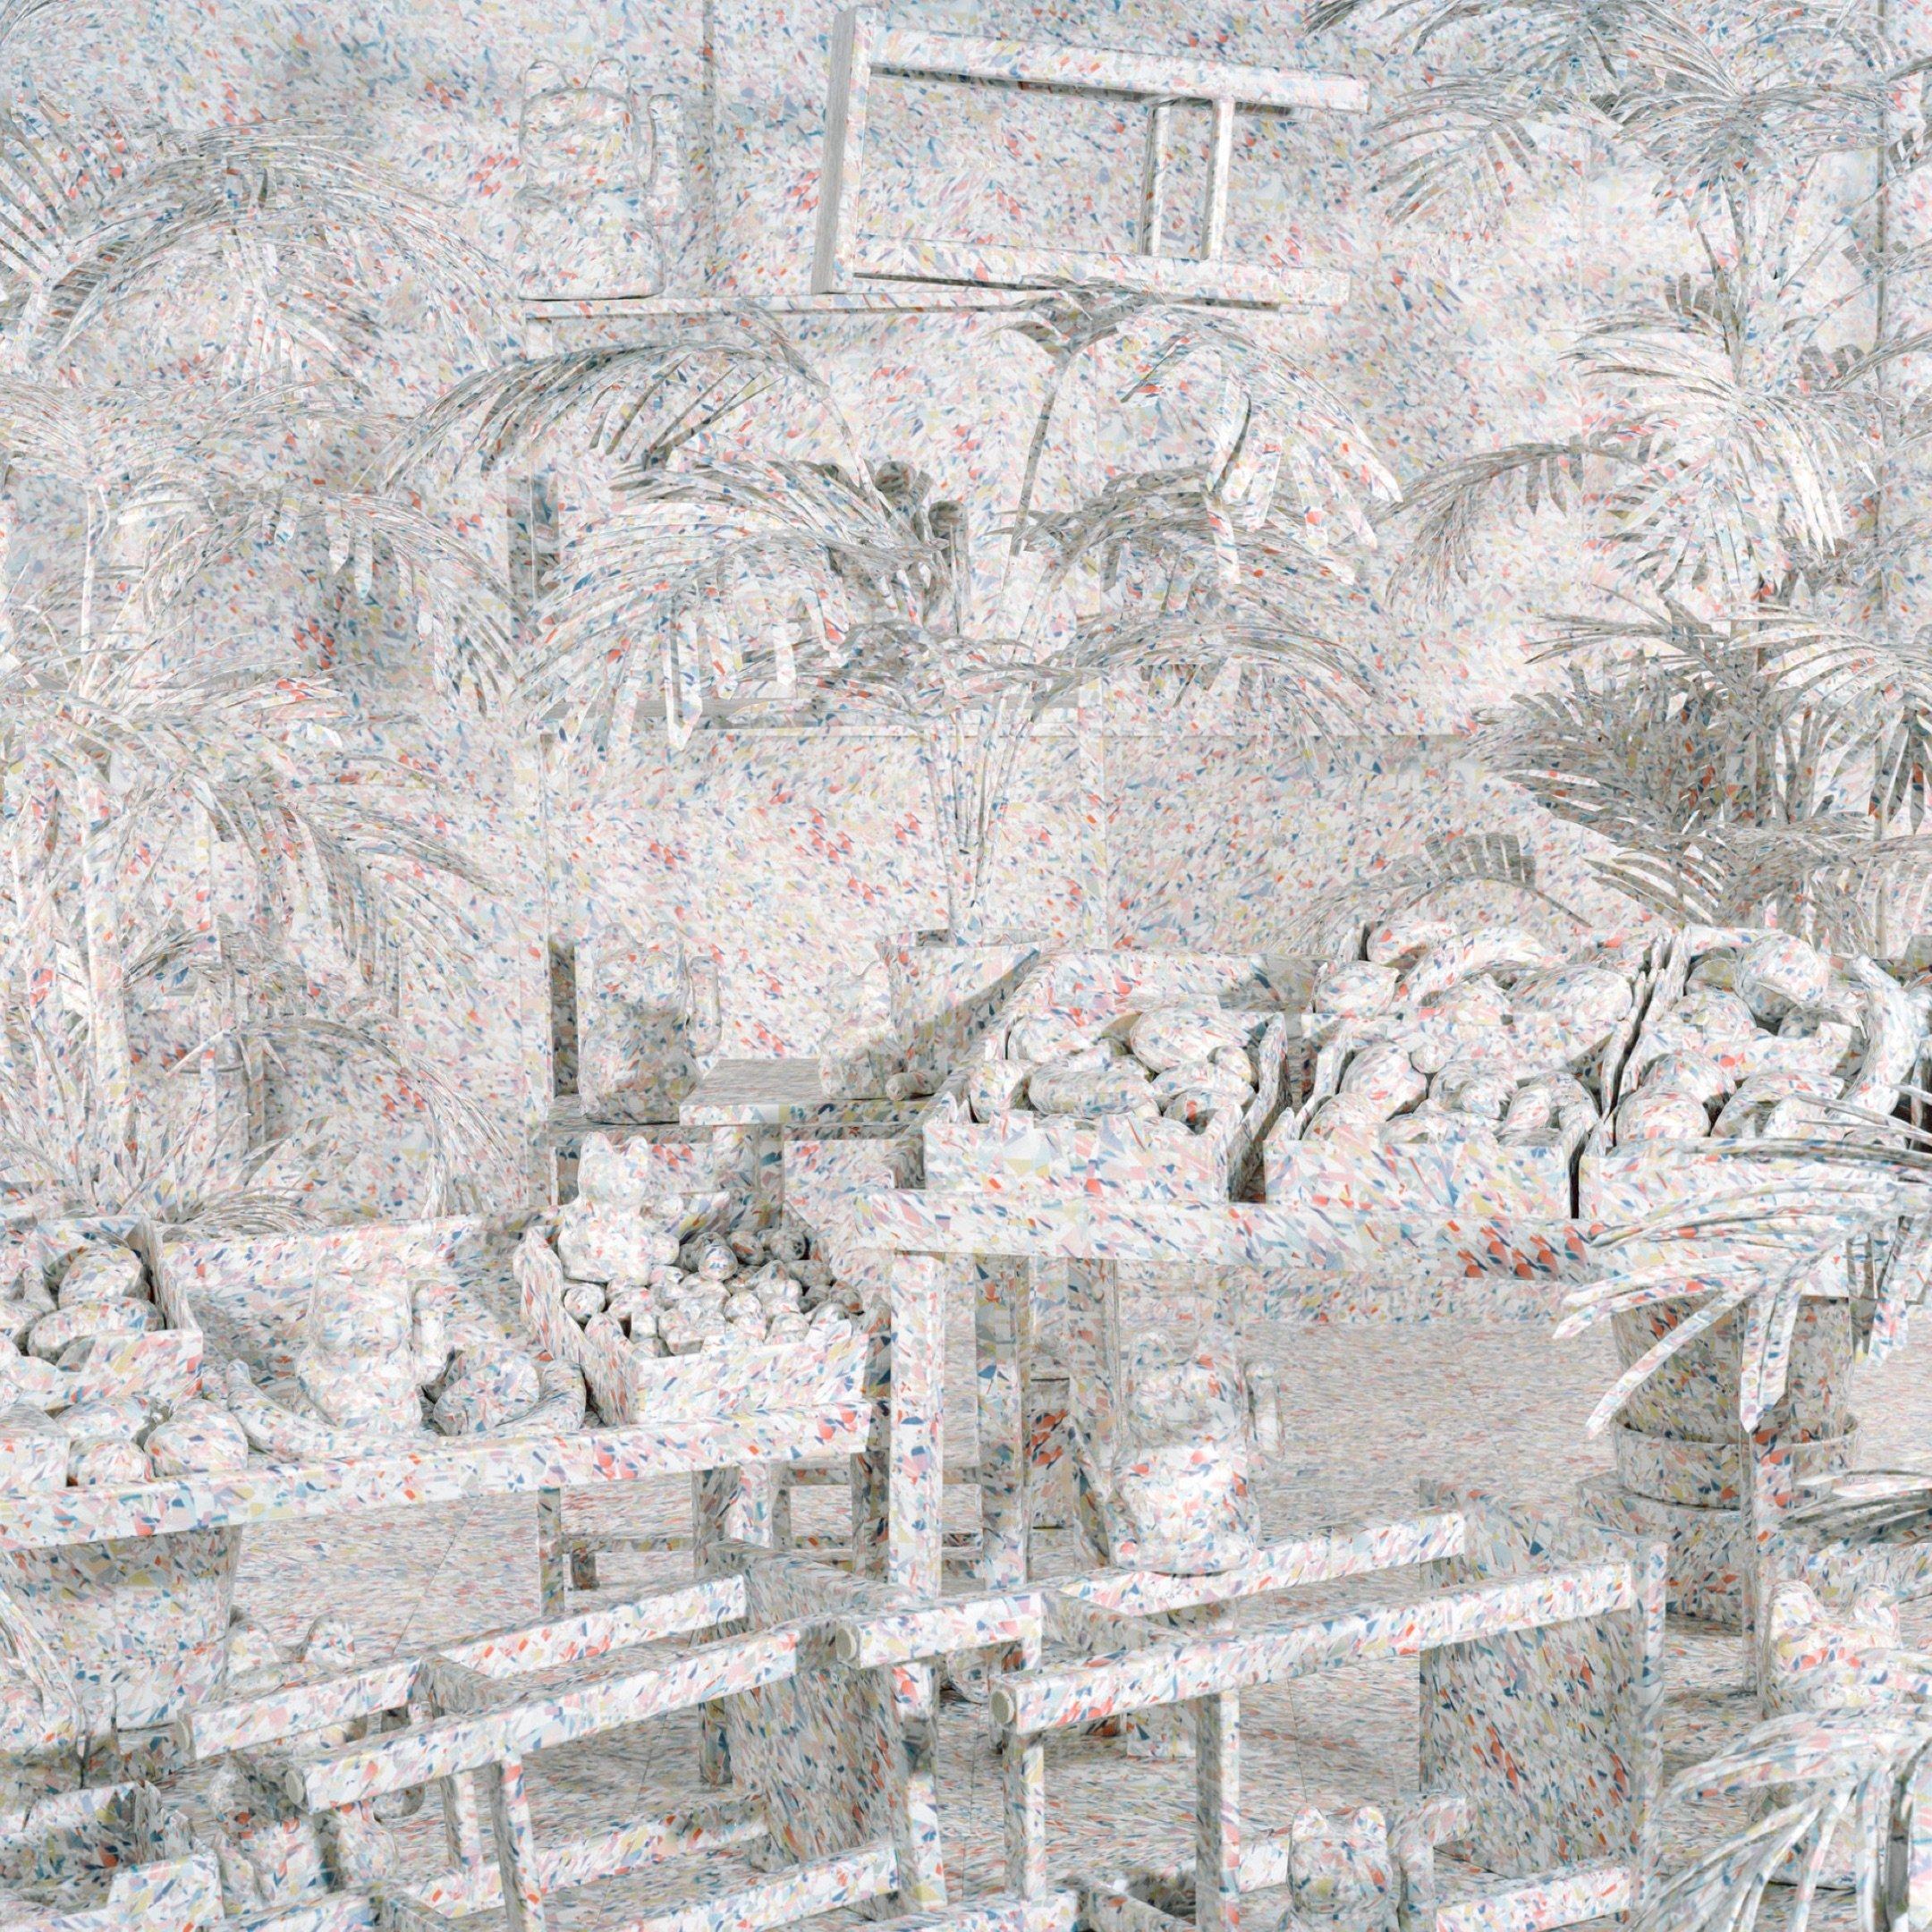 03-7-POST-FEATURE-ART-13